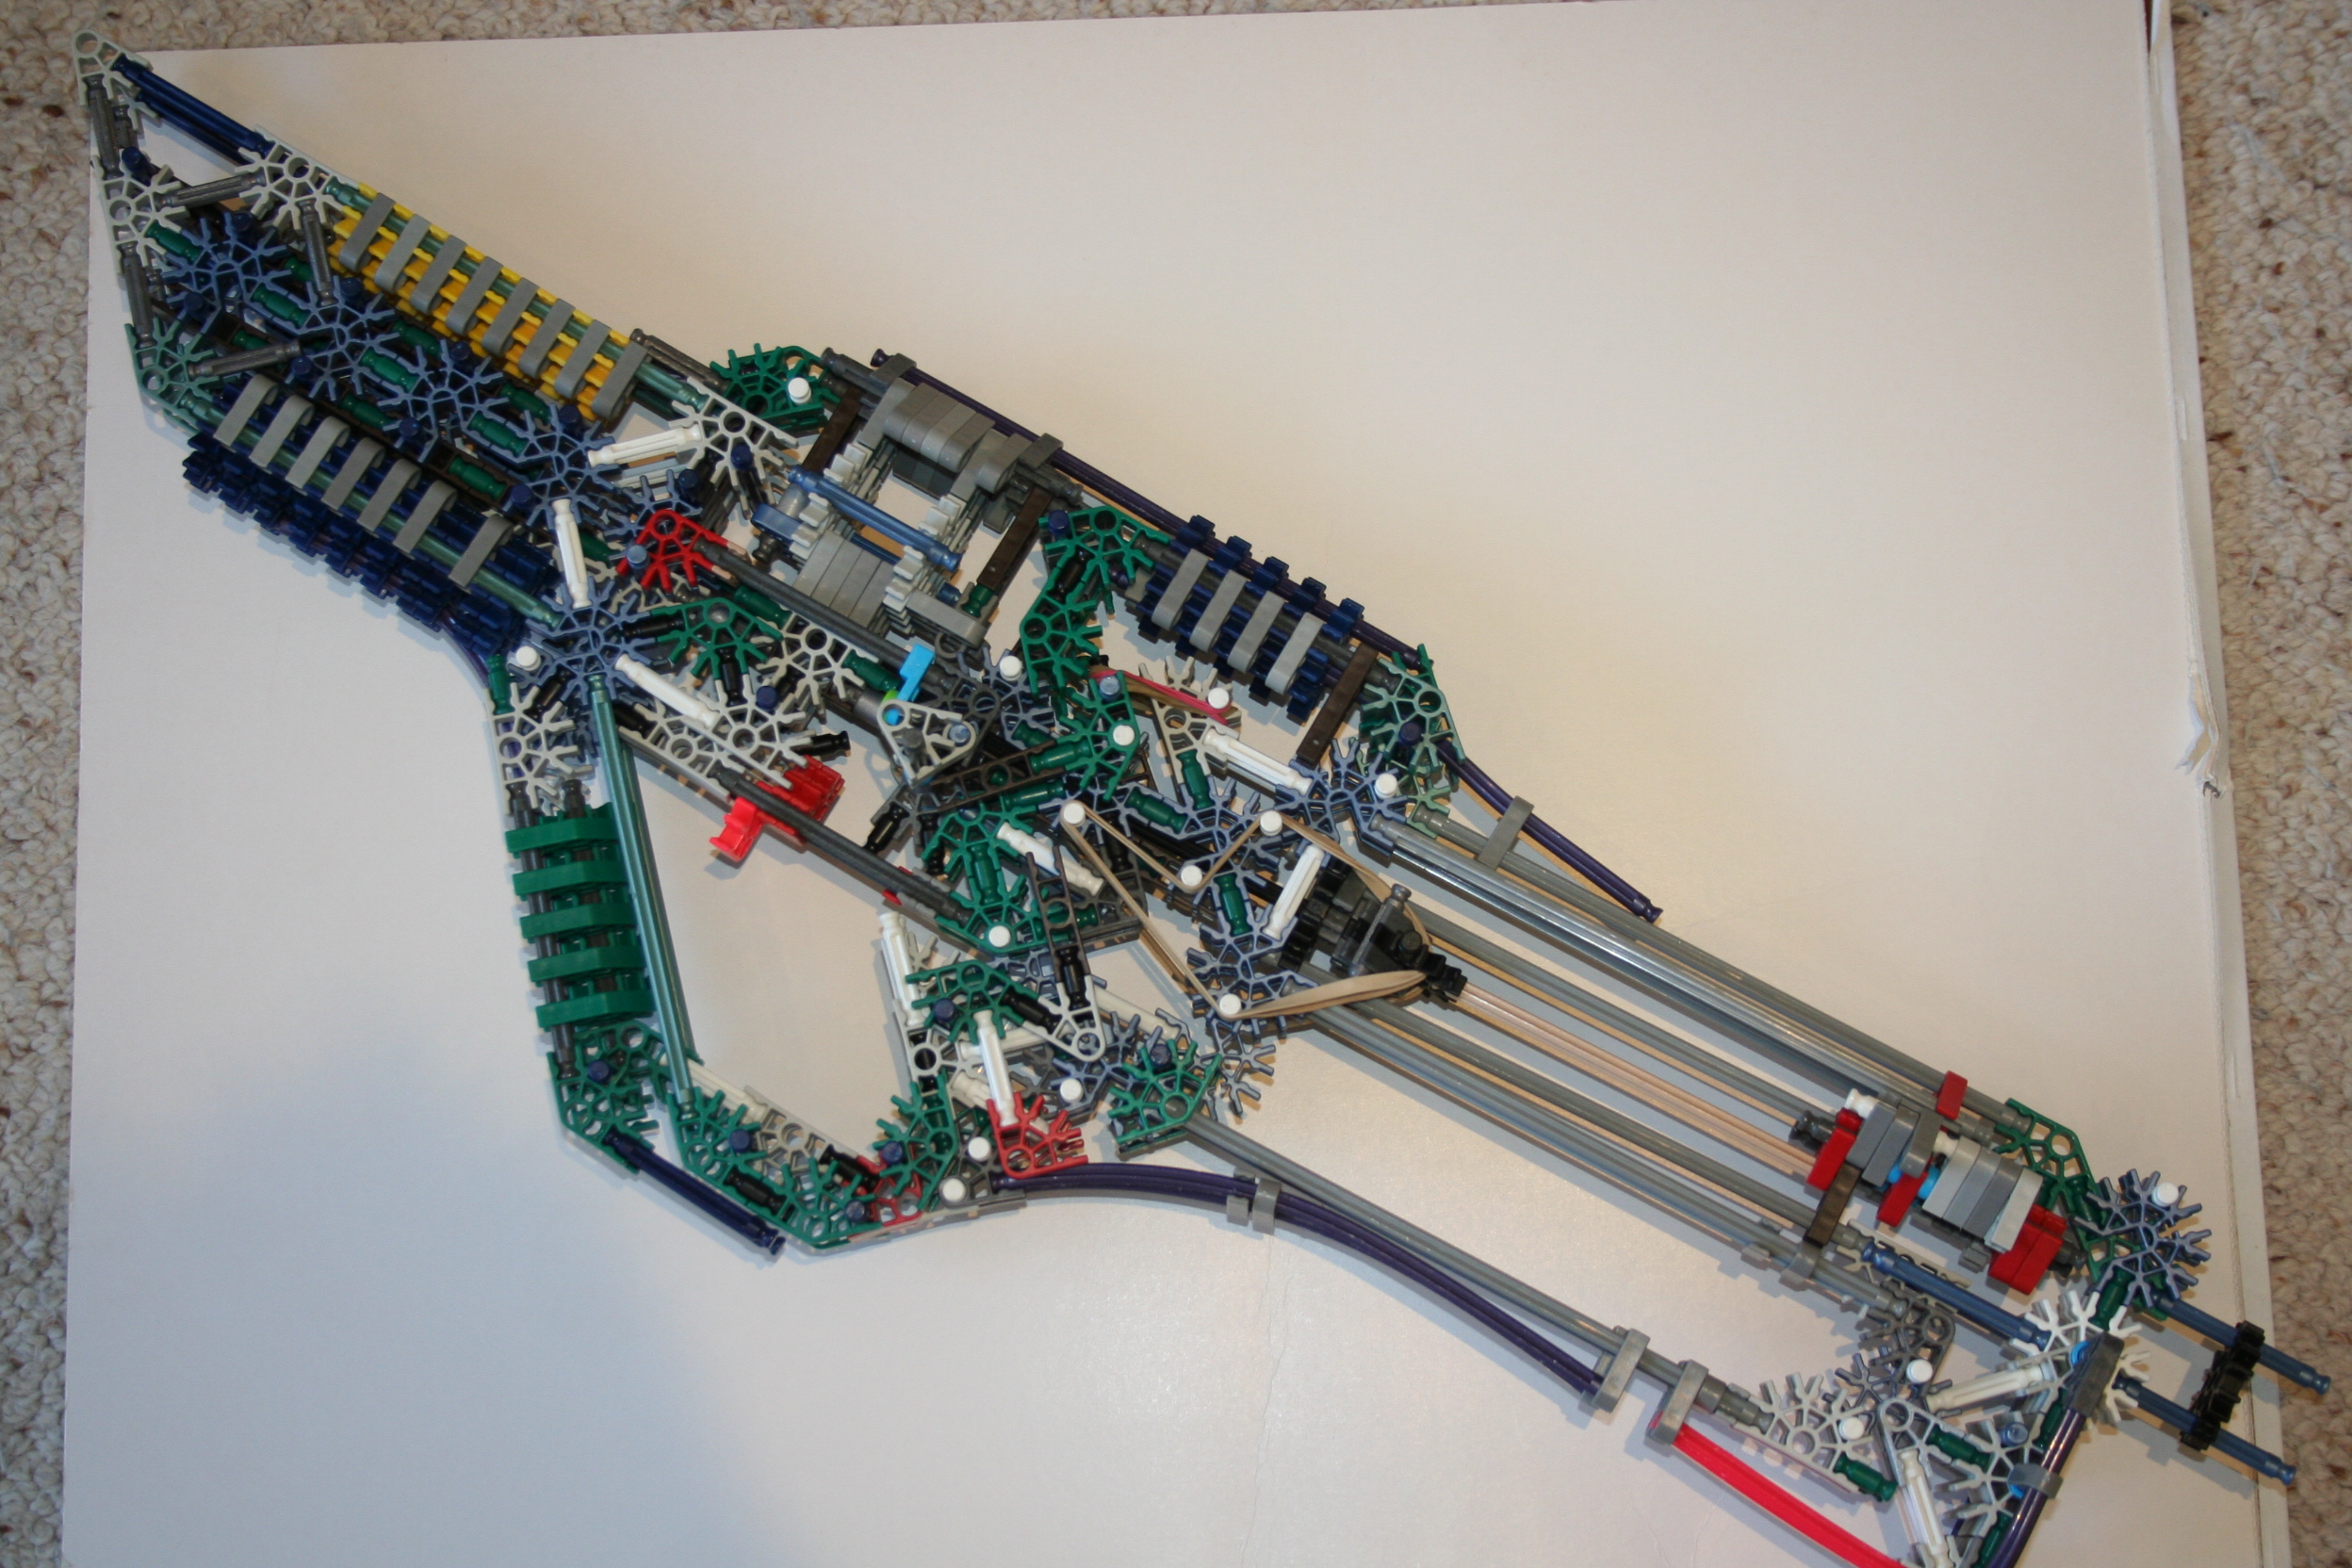 XKR Knex Assault Rifle - big mod of Jager's